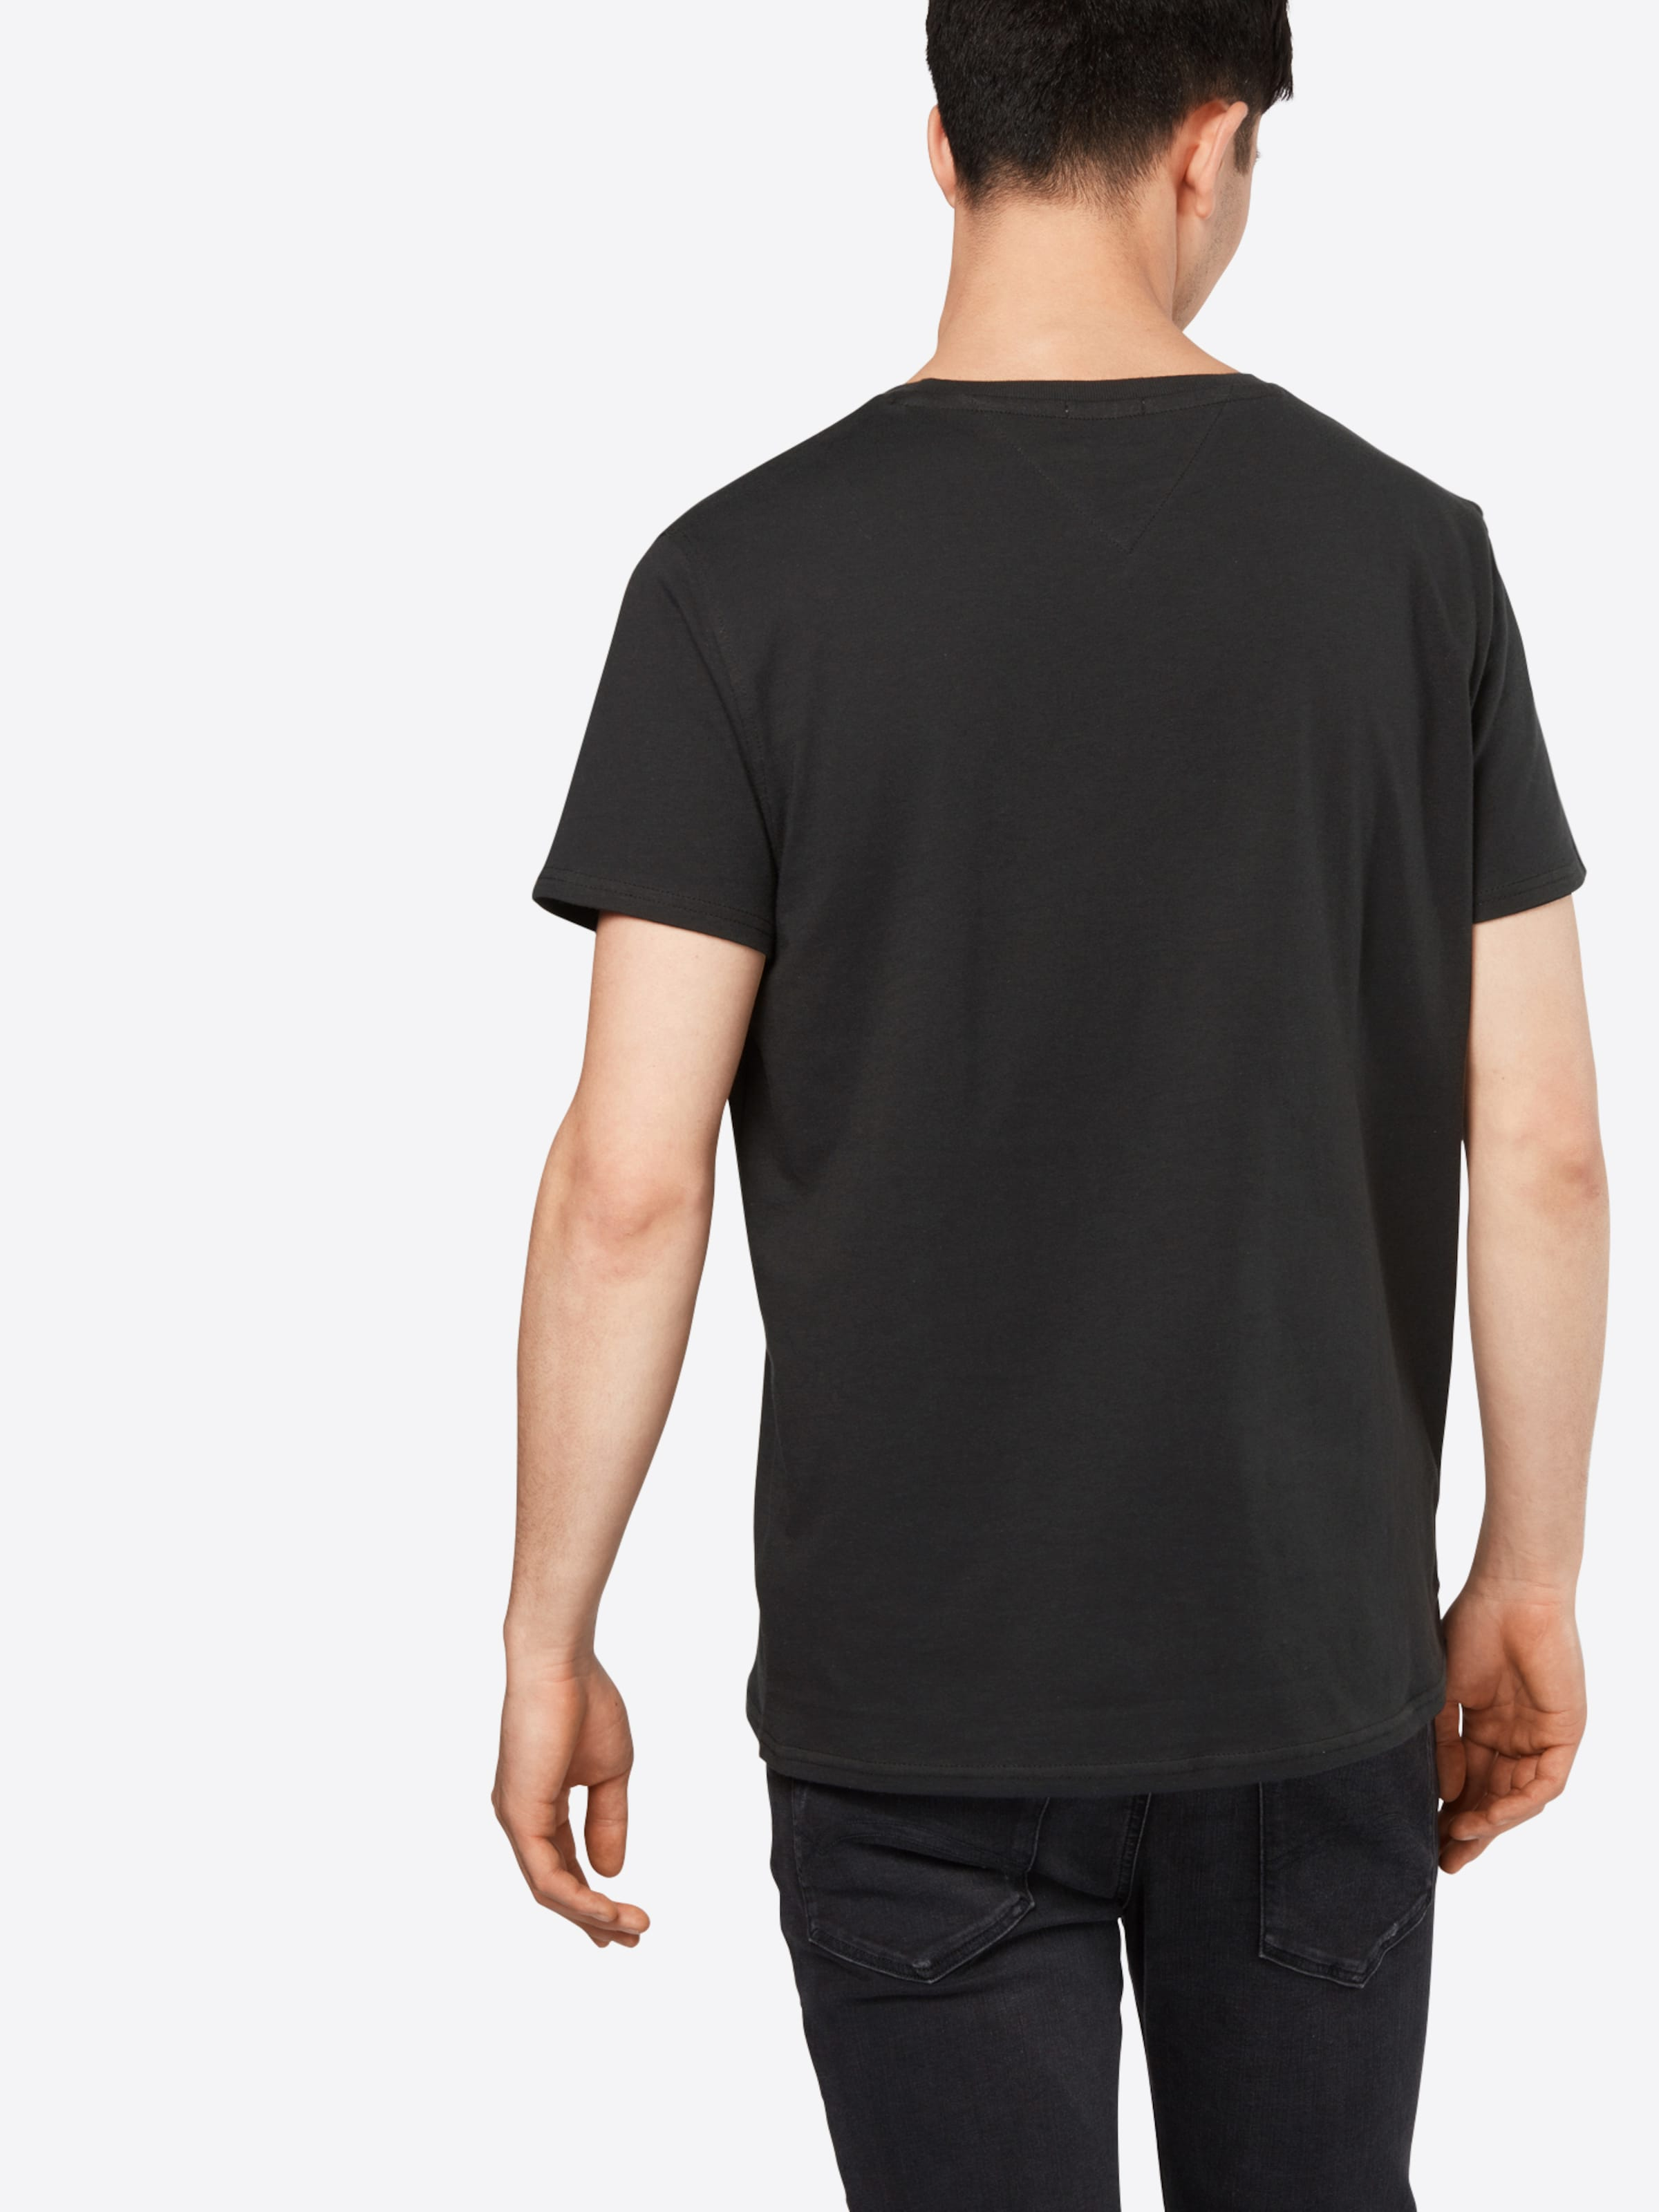 Großhandelspreis Online Rabatt-Codes Online-Shopping Tommy Jeans T-Shirt 'TJM ORIGINAL JERSEY' Neueste RtmPRfnG1f